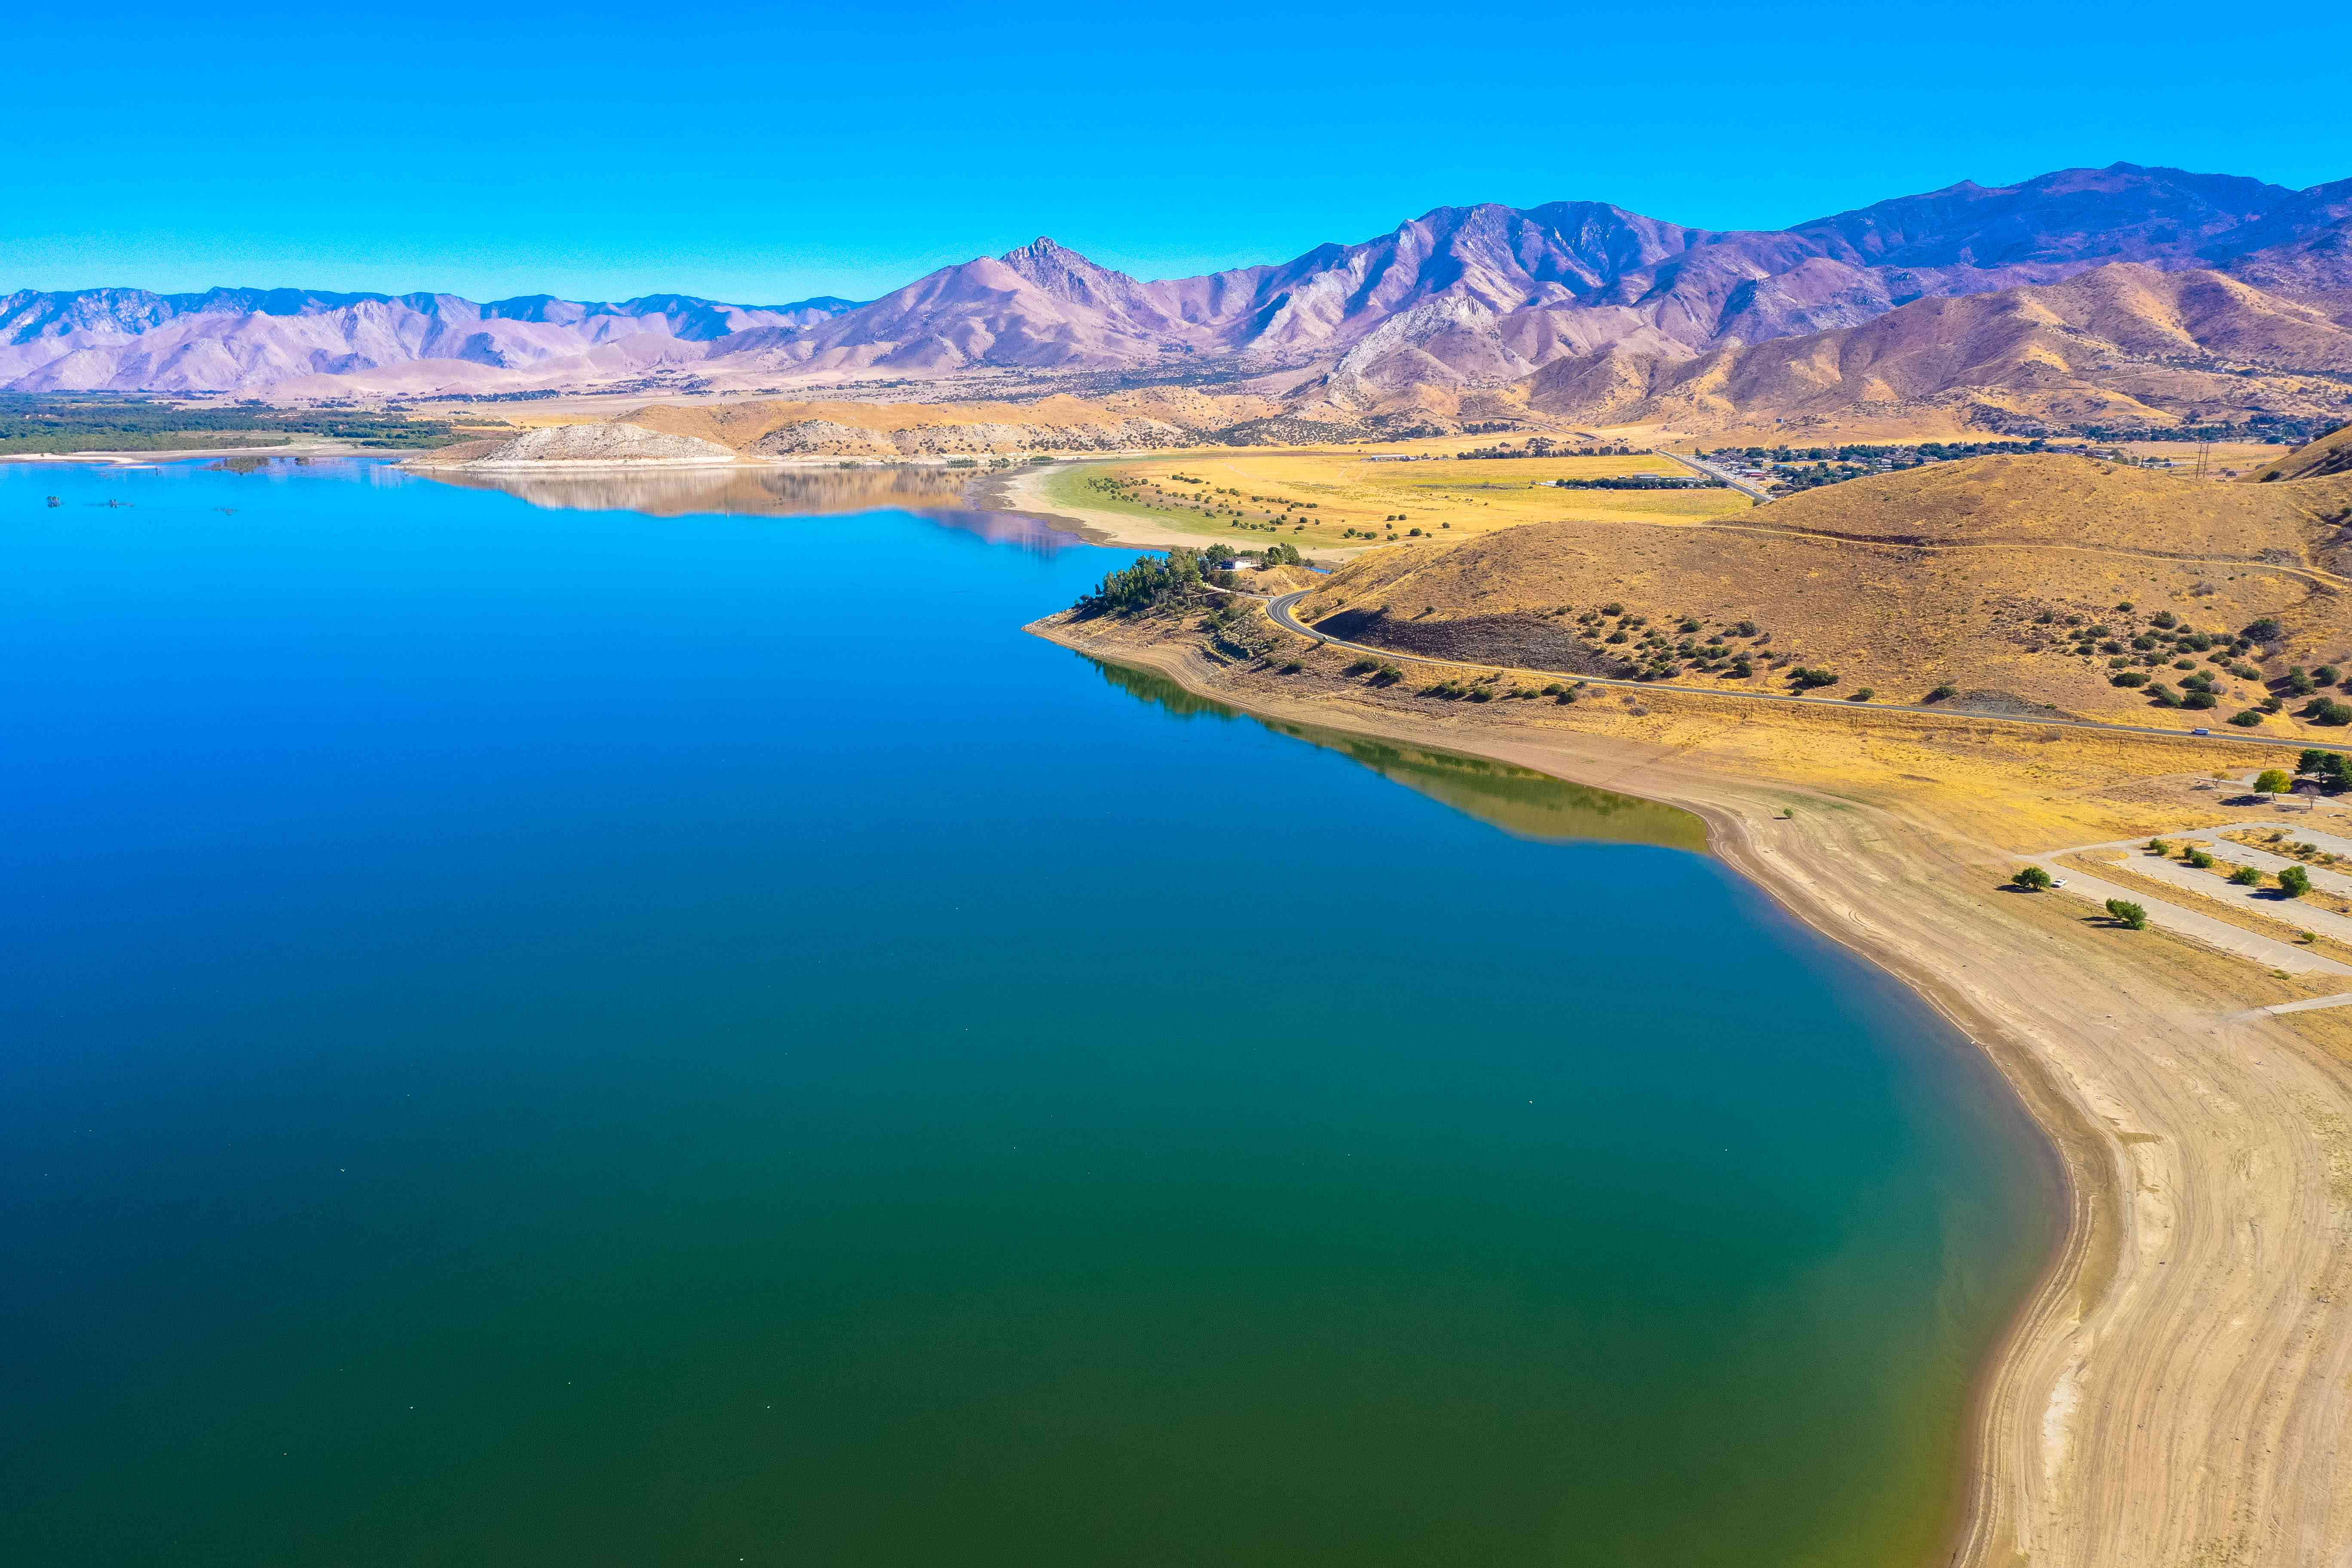 Aerial view, Isabella Lake in California